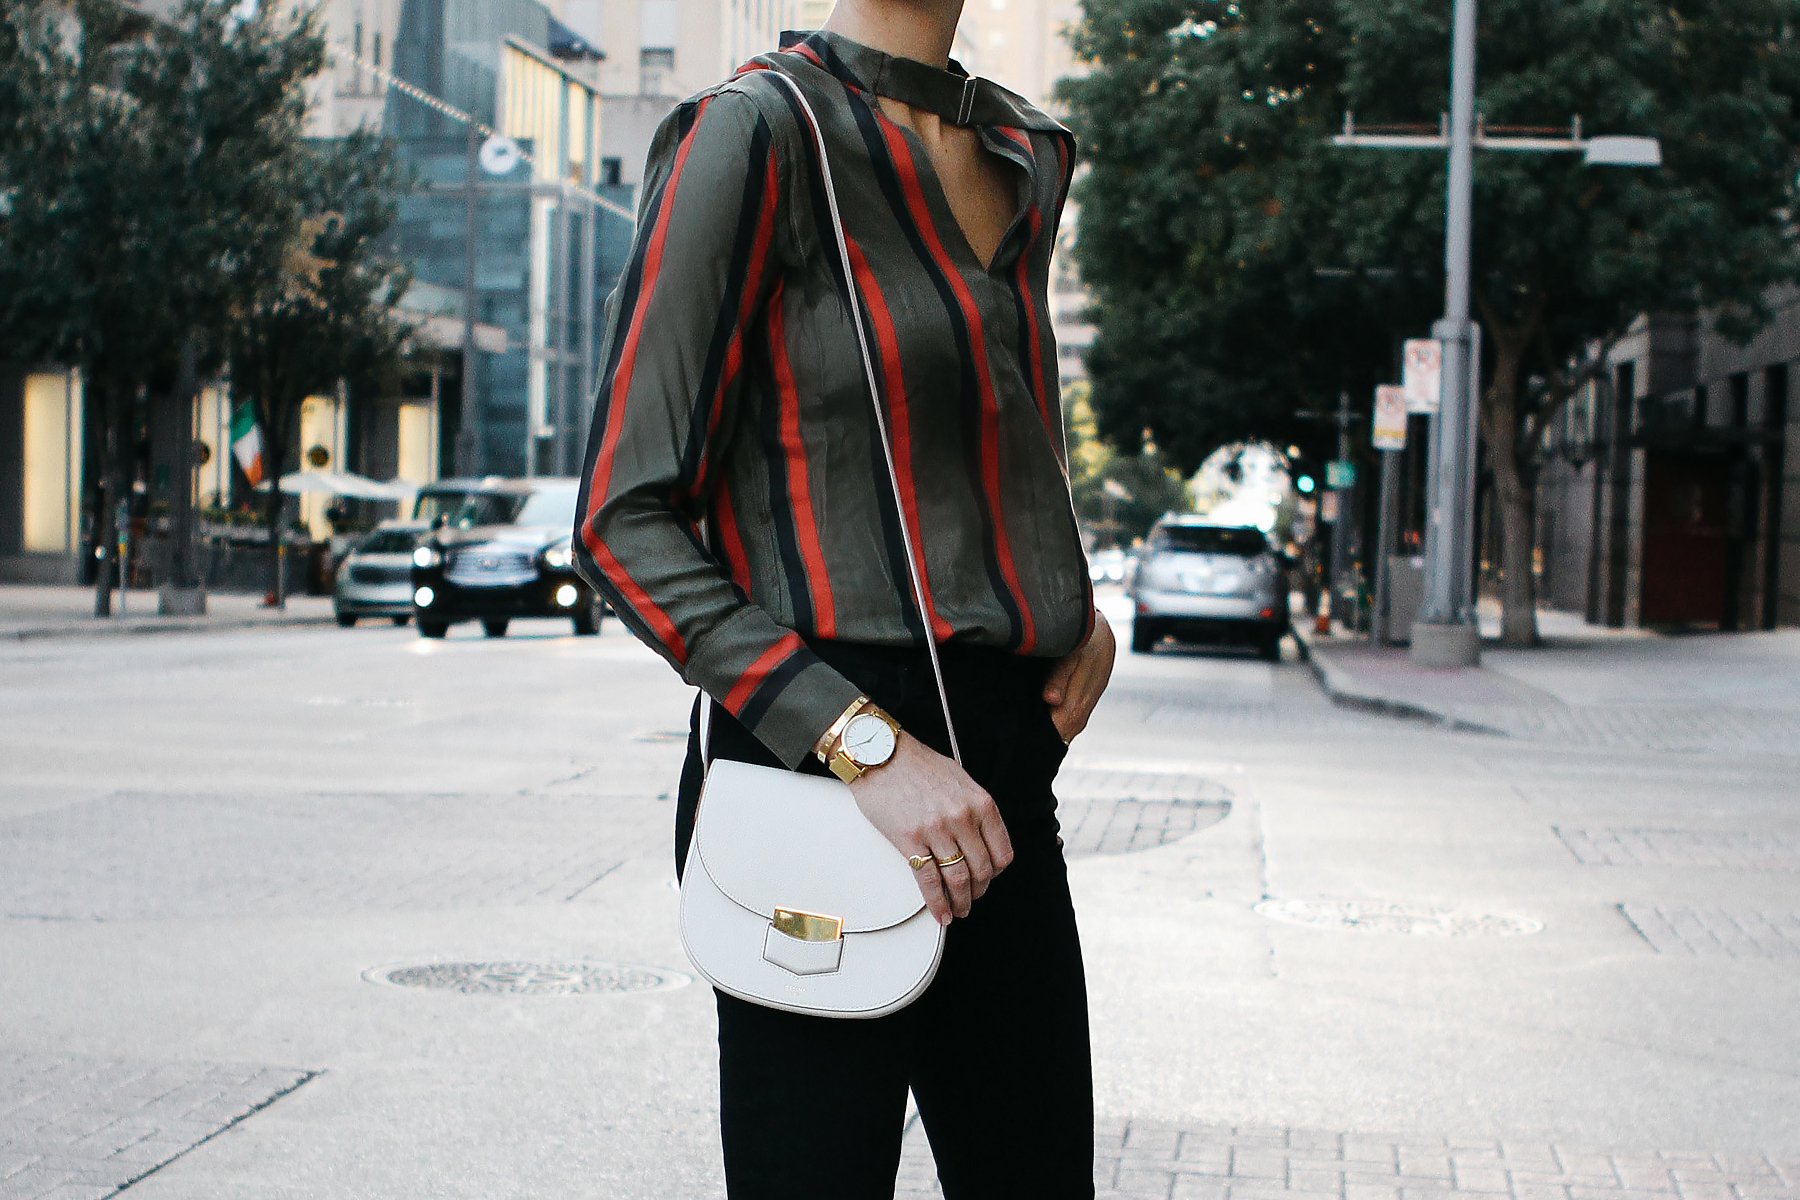 Equipment Janelle Striped Blouse Celine Trotteur White Handbag Fashion Jackson Dallas Blogger Fashion Blogger Street Style